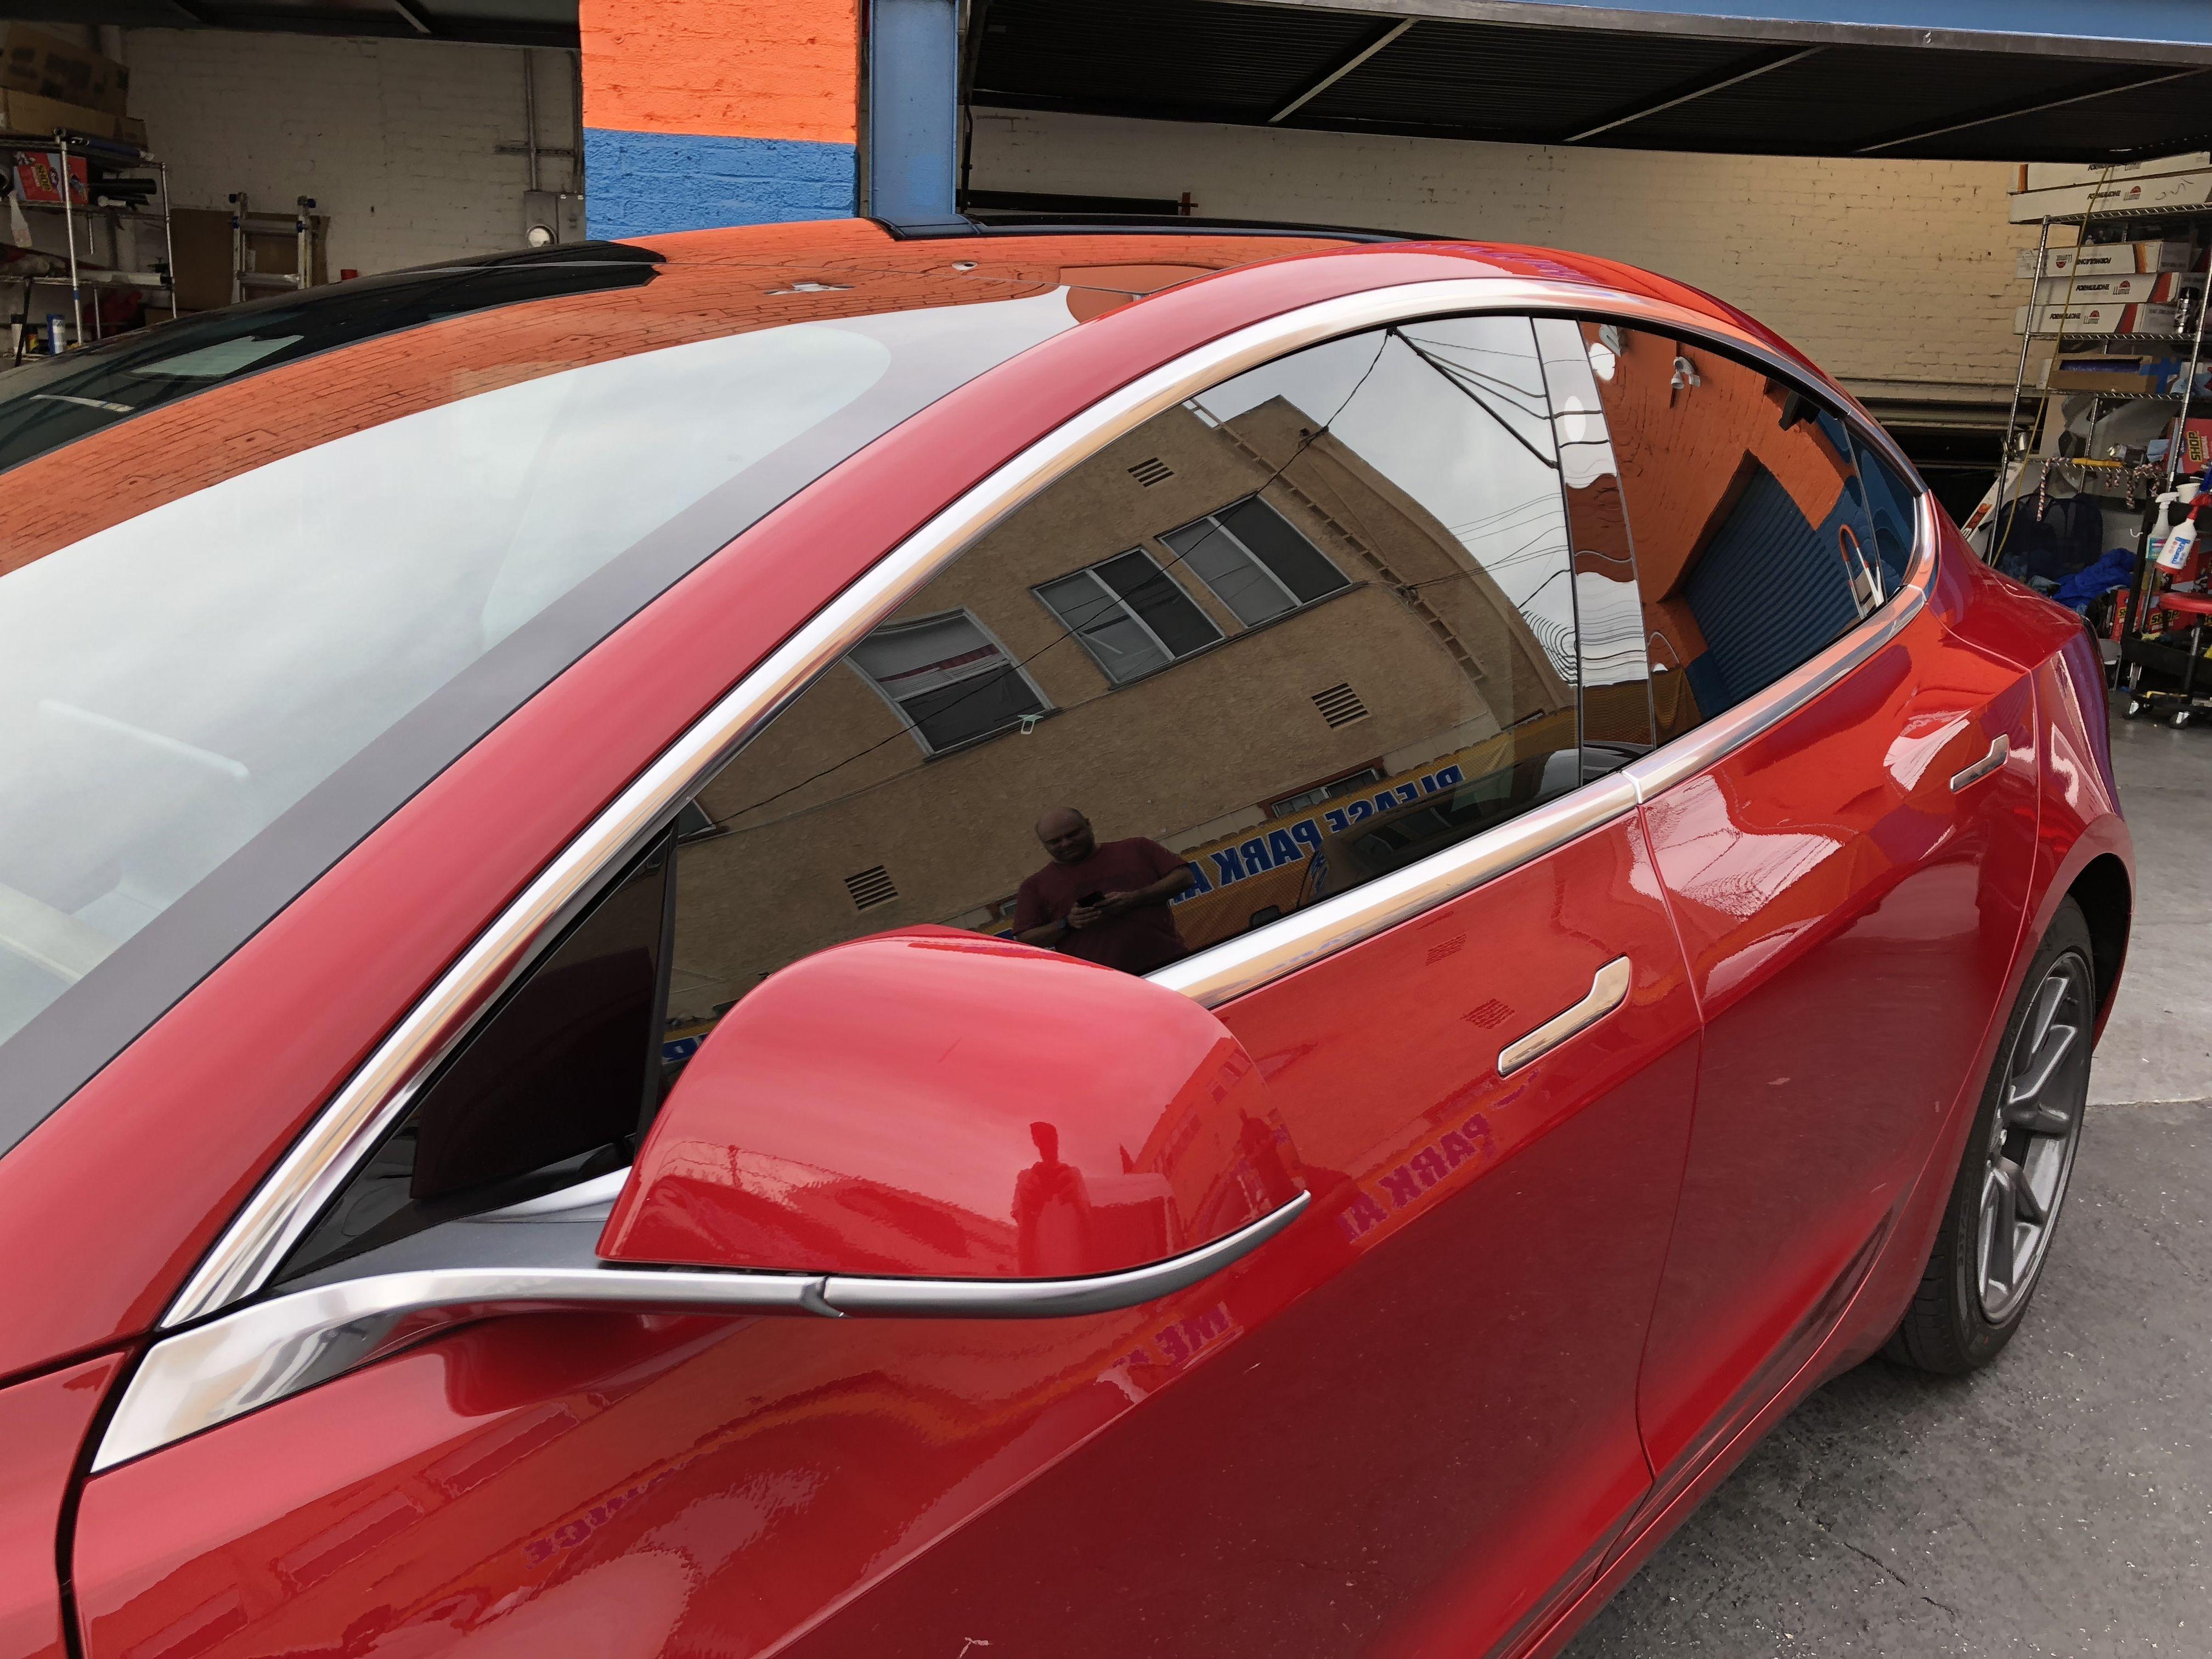 Huper Optik Ceramic Tint 30 Installed On Tesla Model 3 Tinted Windows Tints Tesla Model